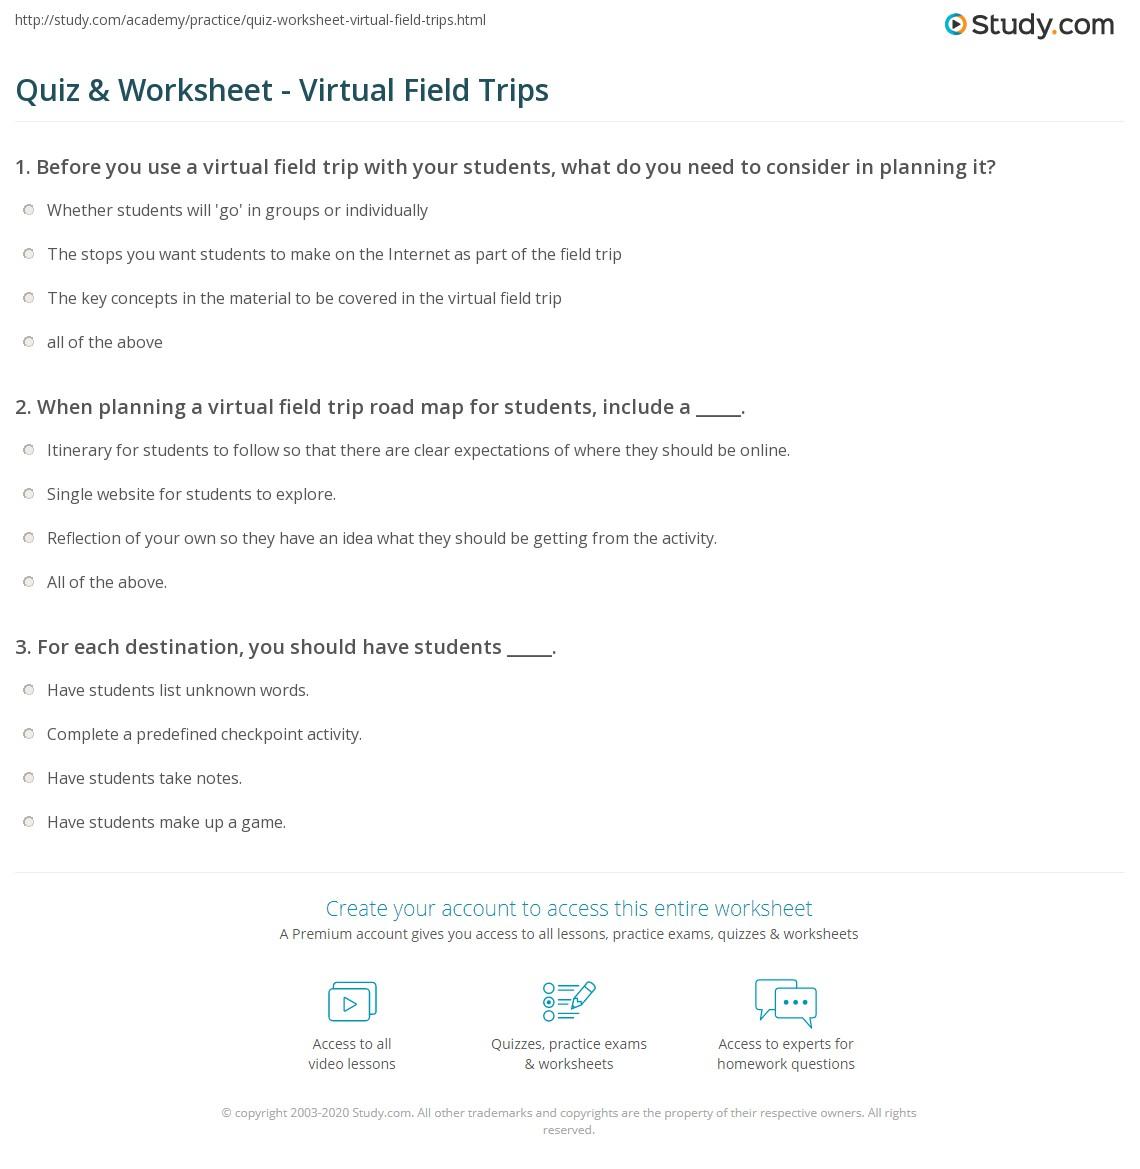 quiz & worksheet - virtual field trips | study